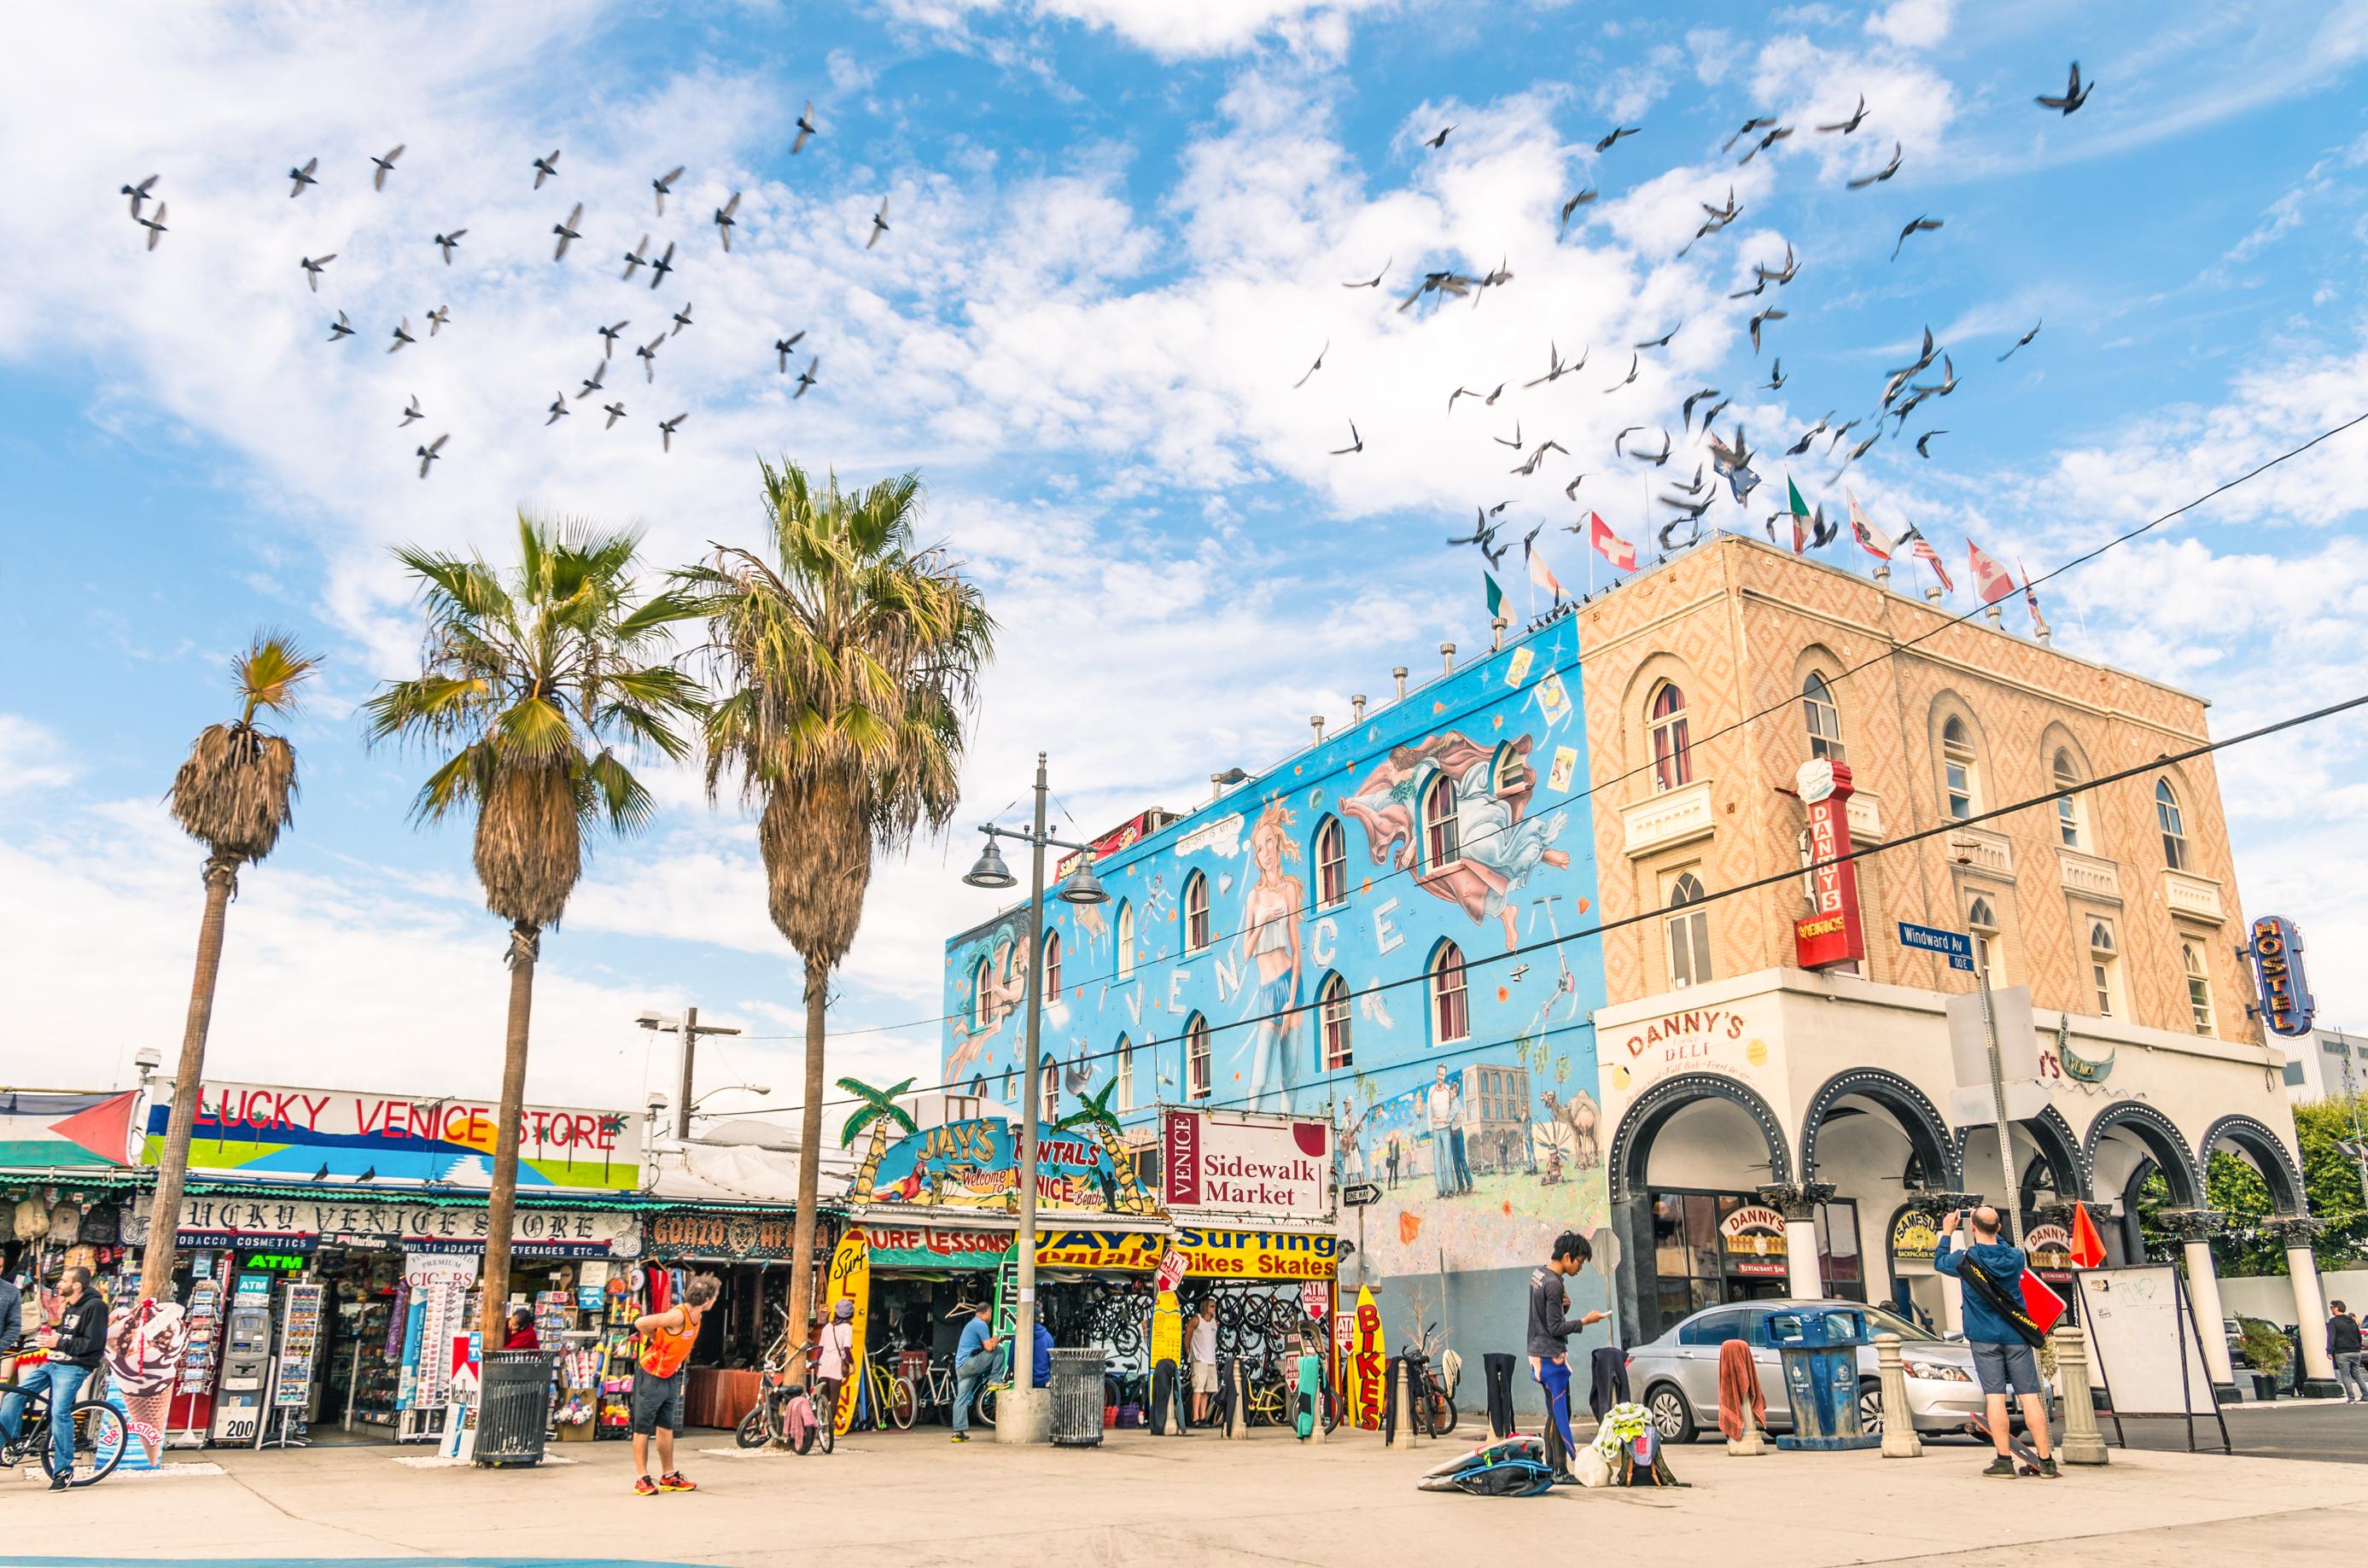 Big mural in Winward Avenue at Venice Beach in California